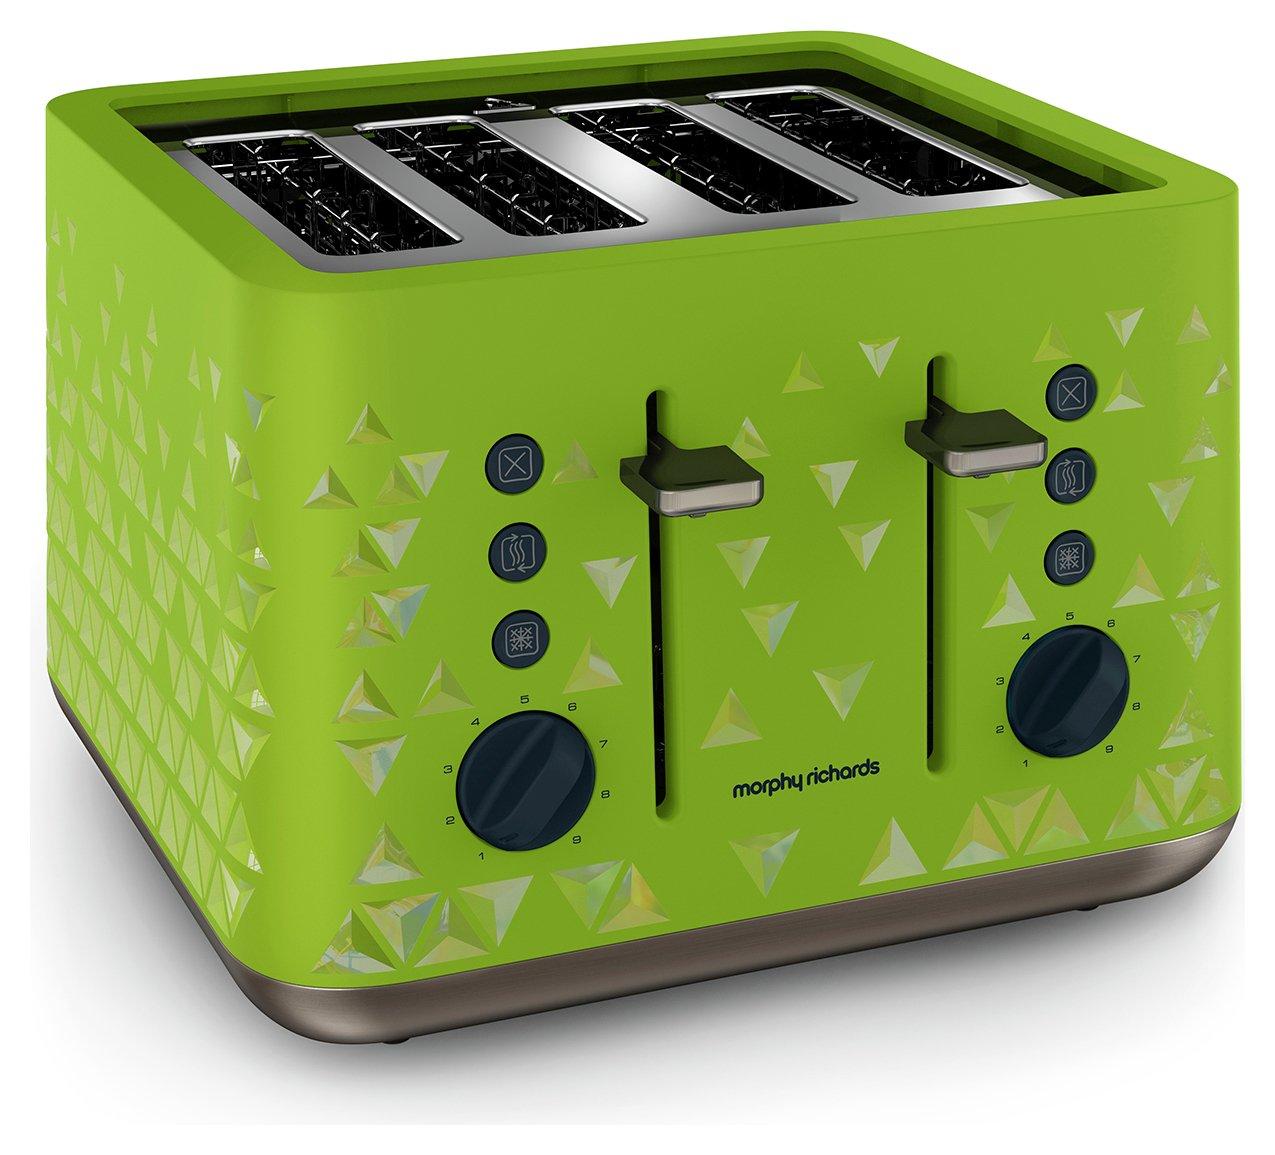 Morphy Richards Prism Toaster - Green.